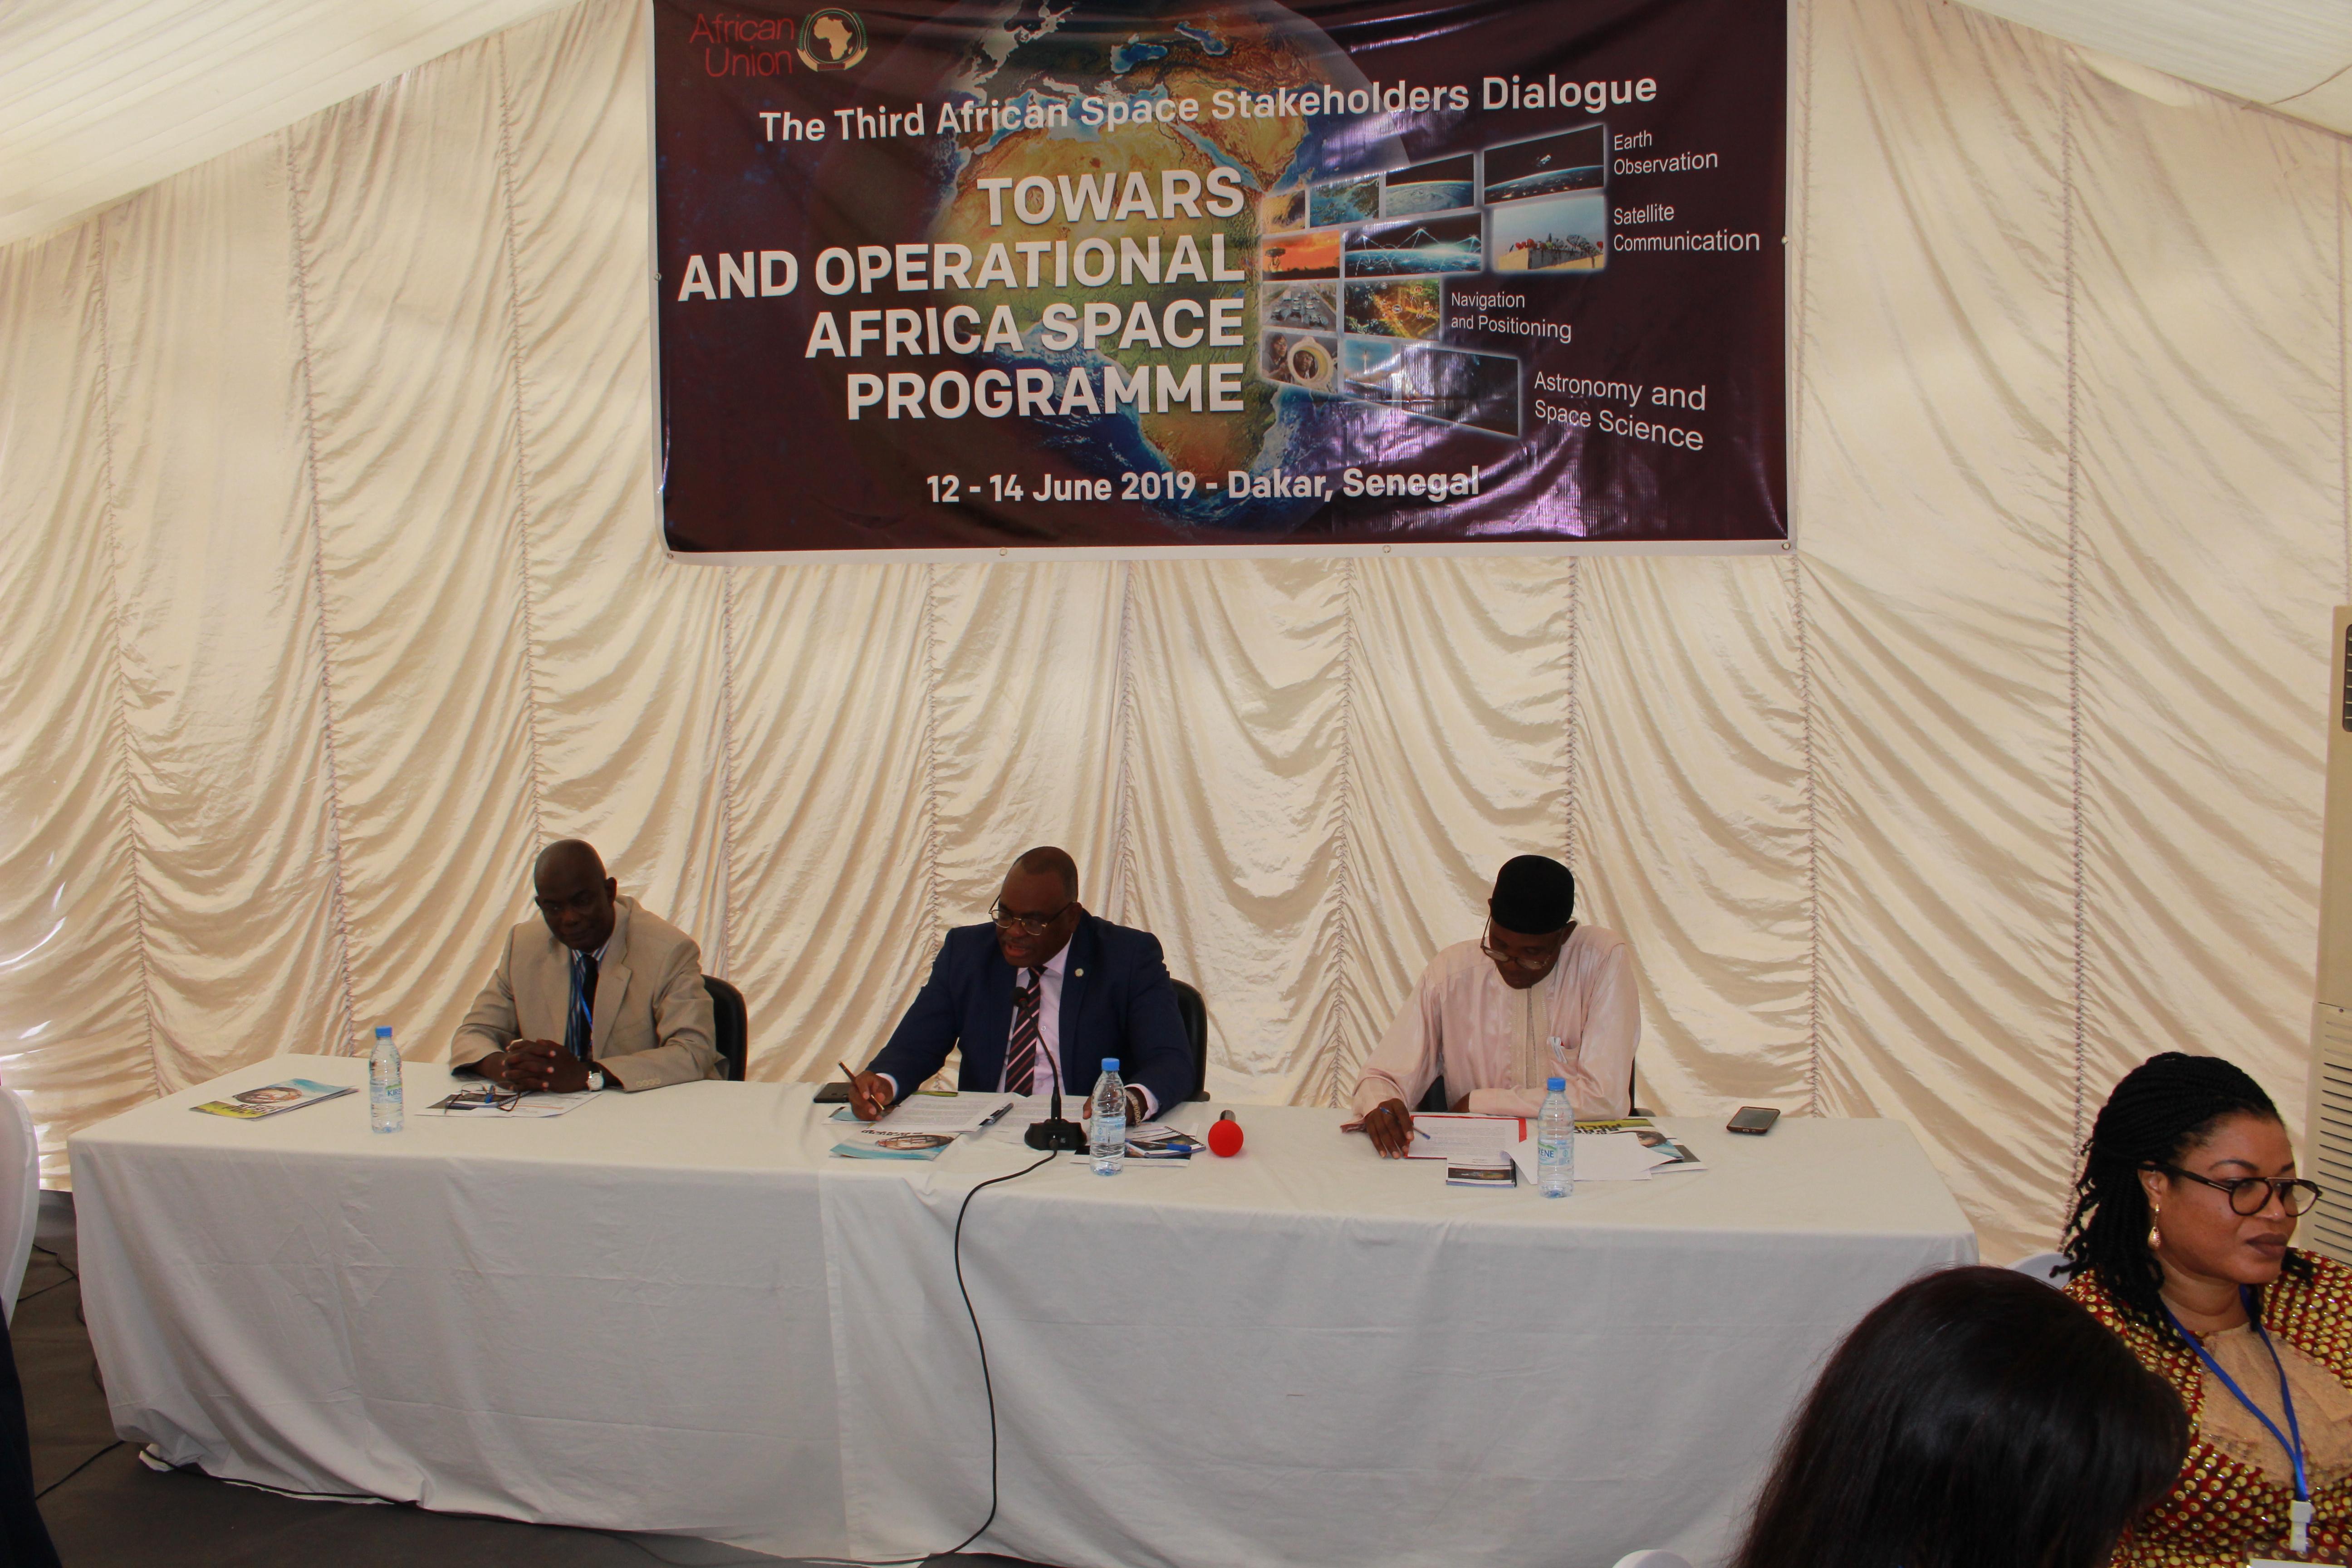 Third African Space Stakeholders Dialogue begins in Dakar, Senegal